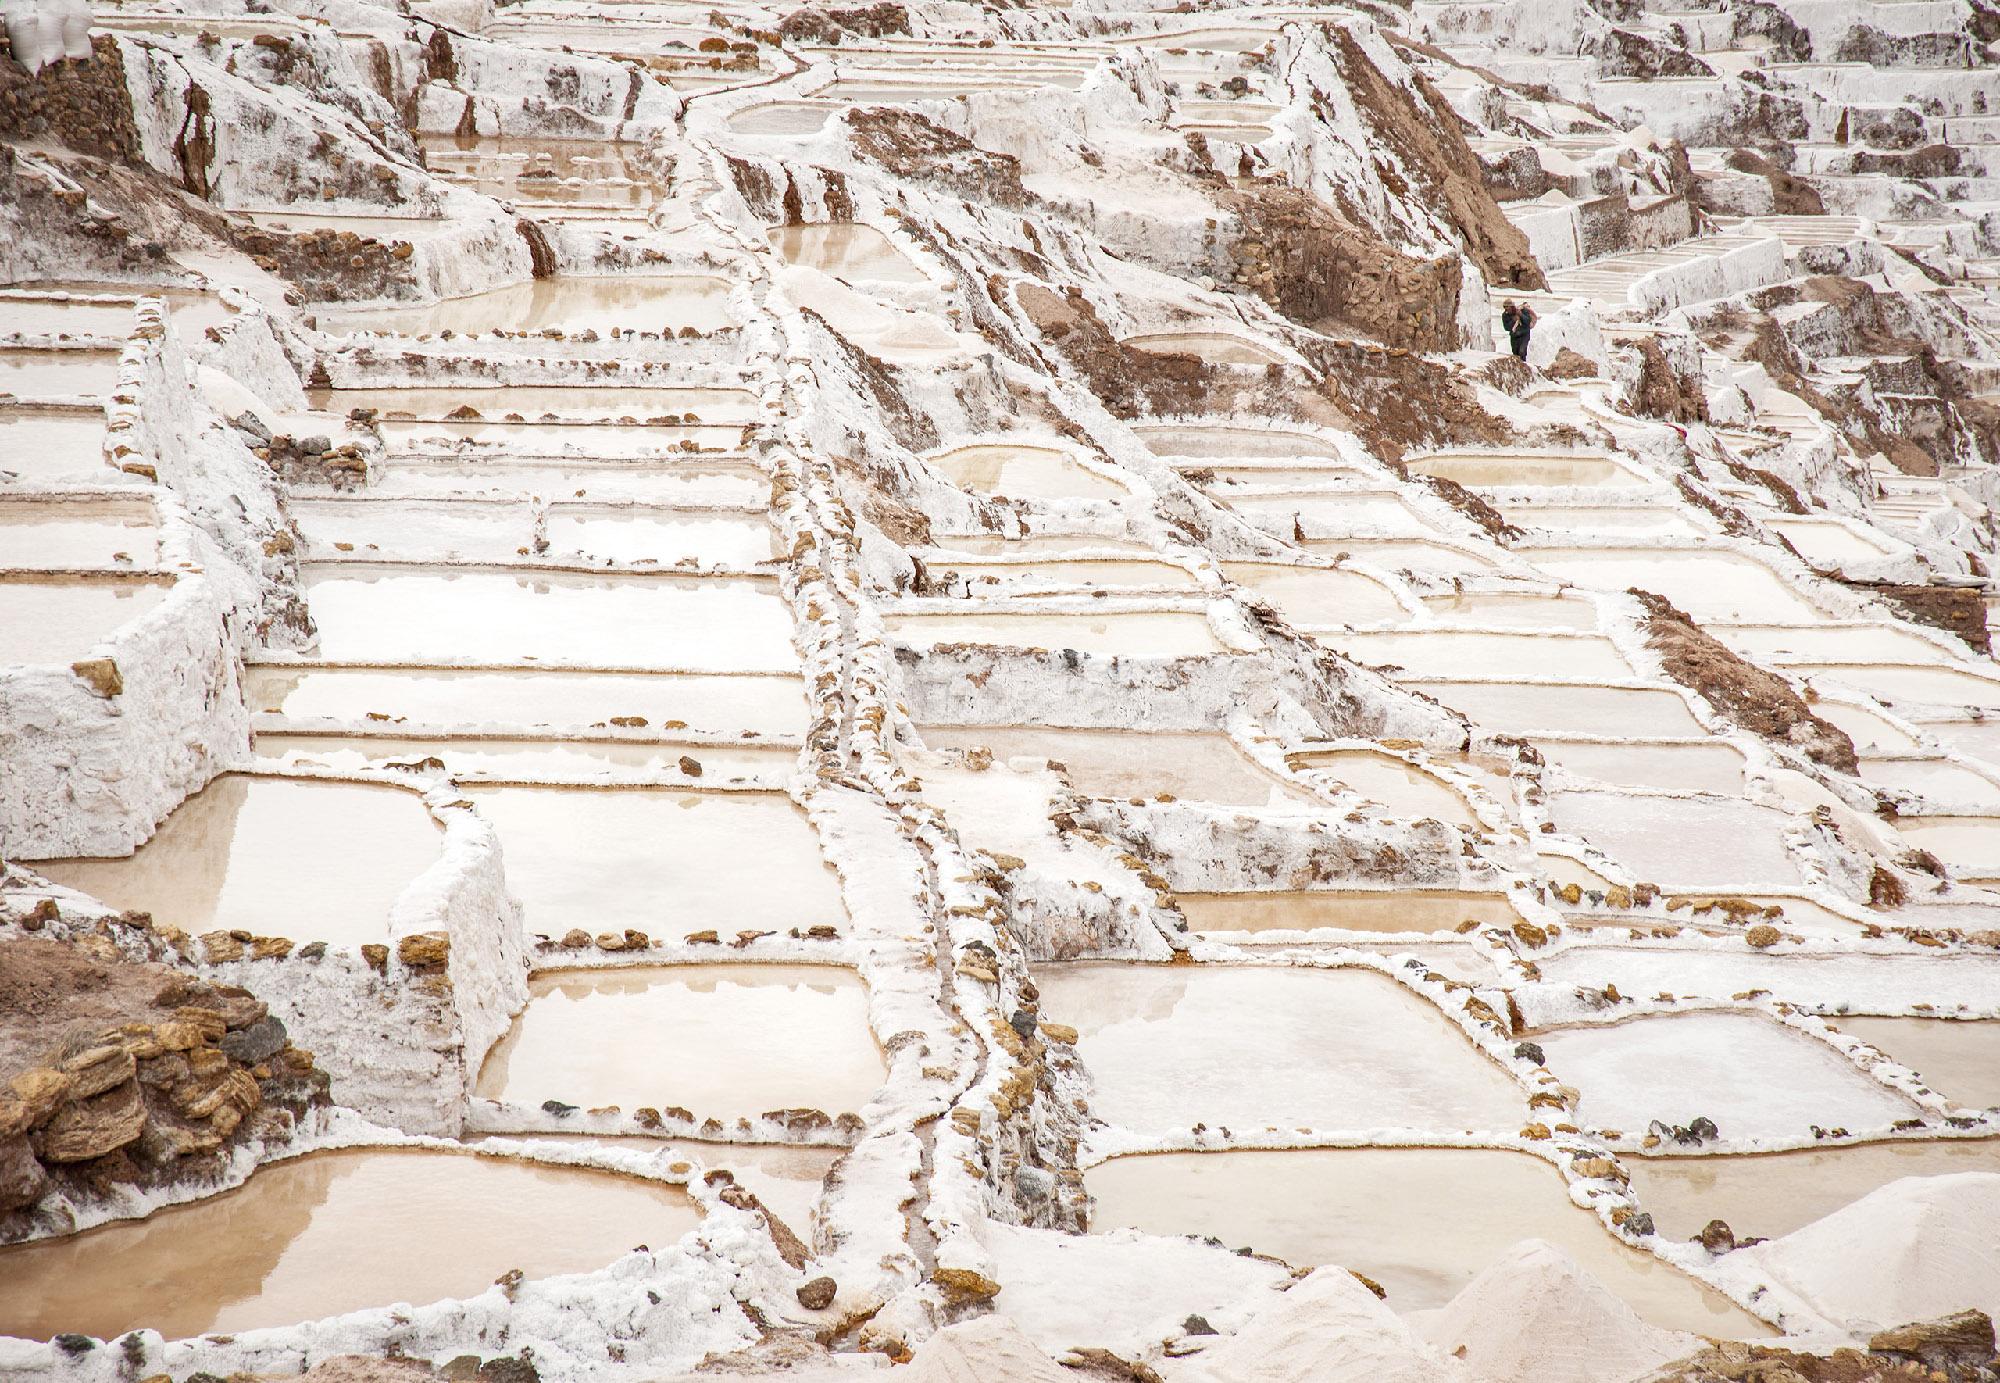 SALT MINES PERU.jpg